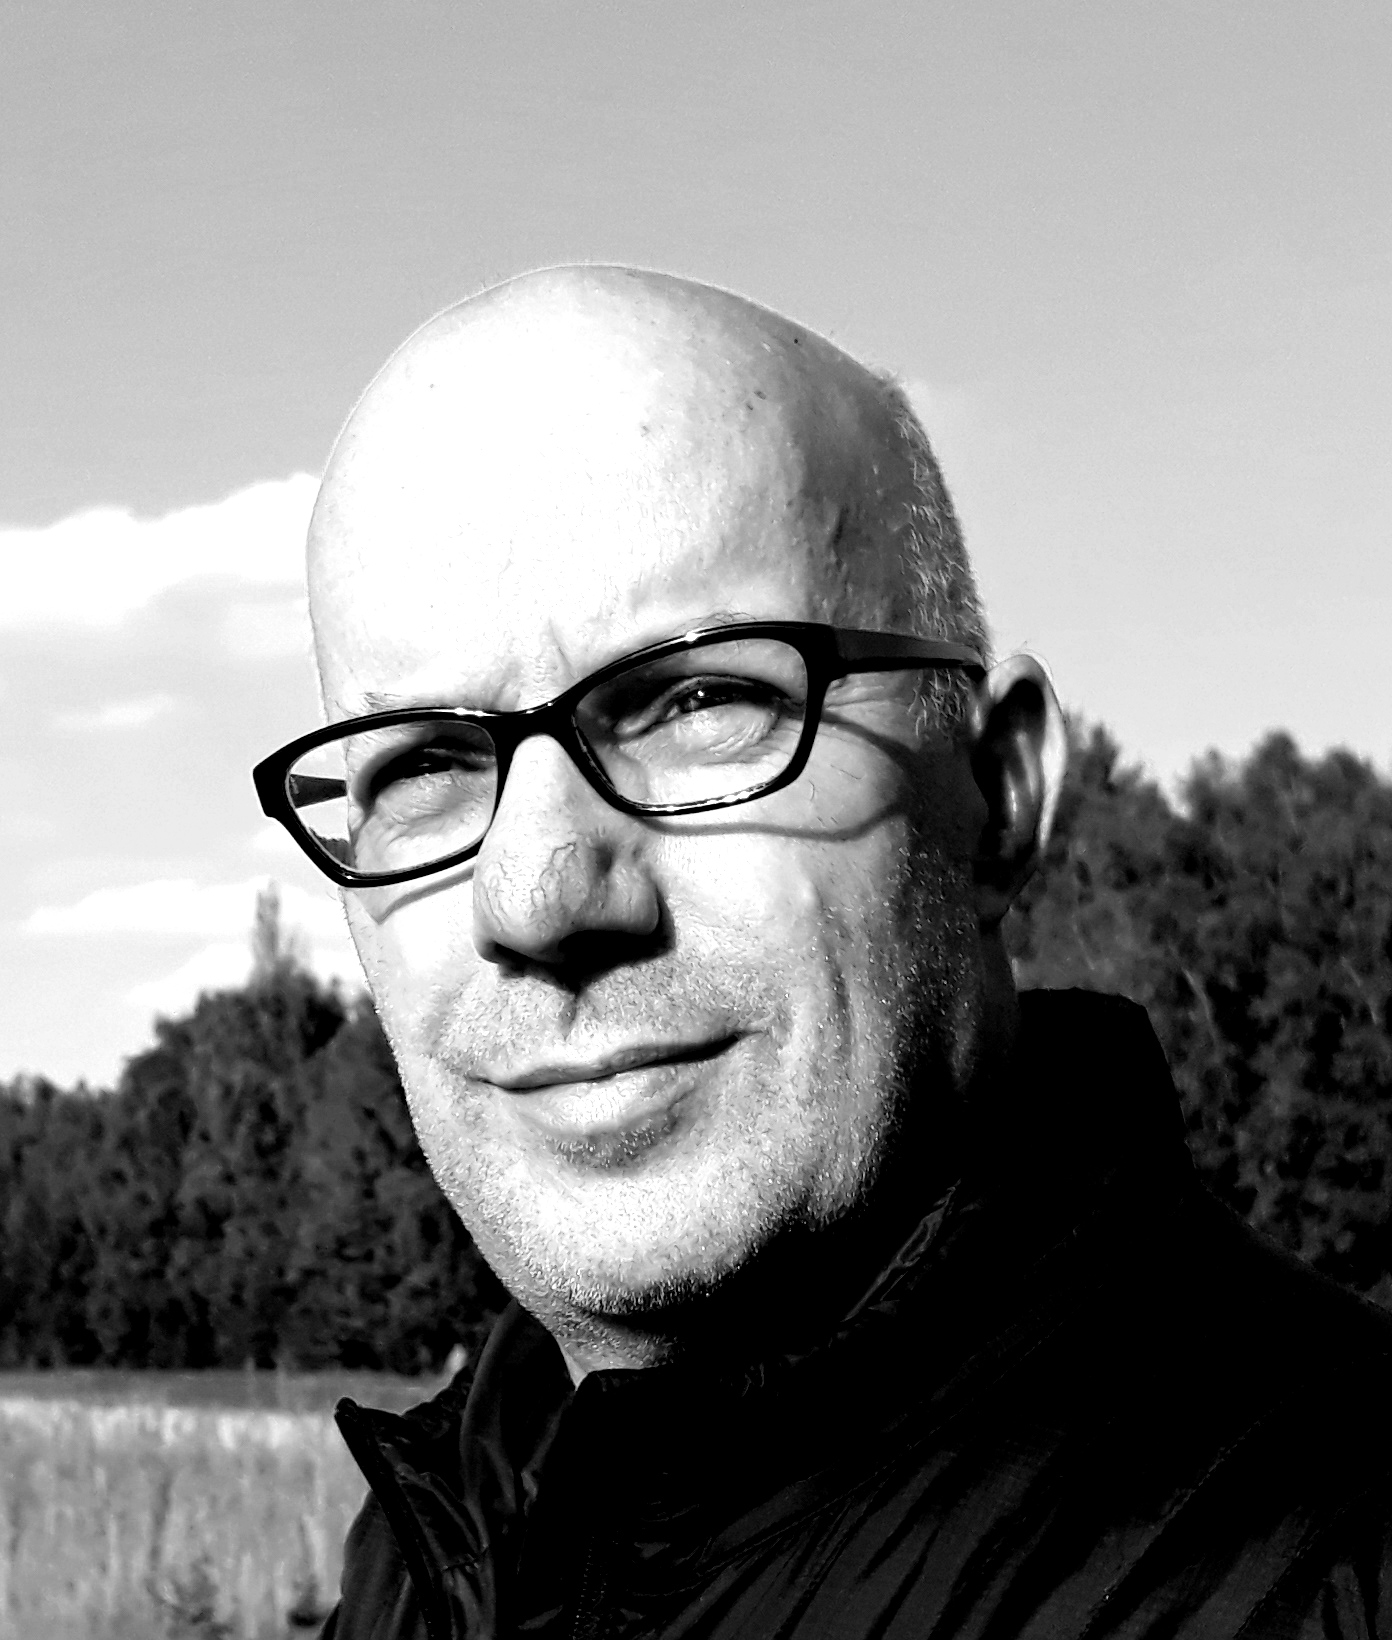 Jürgen Bschaden